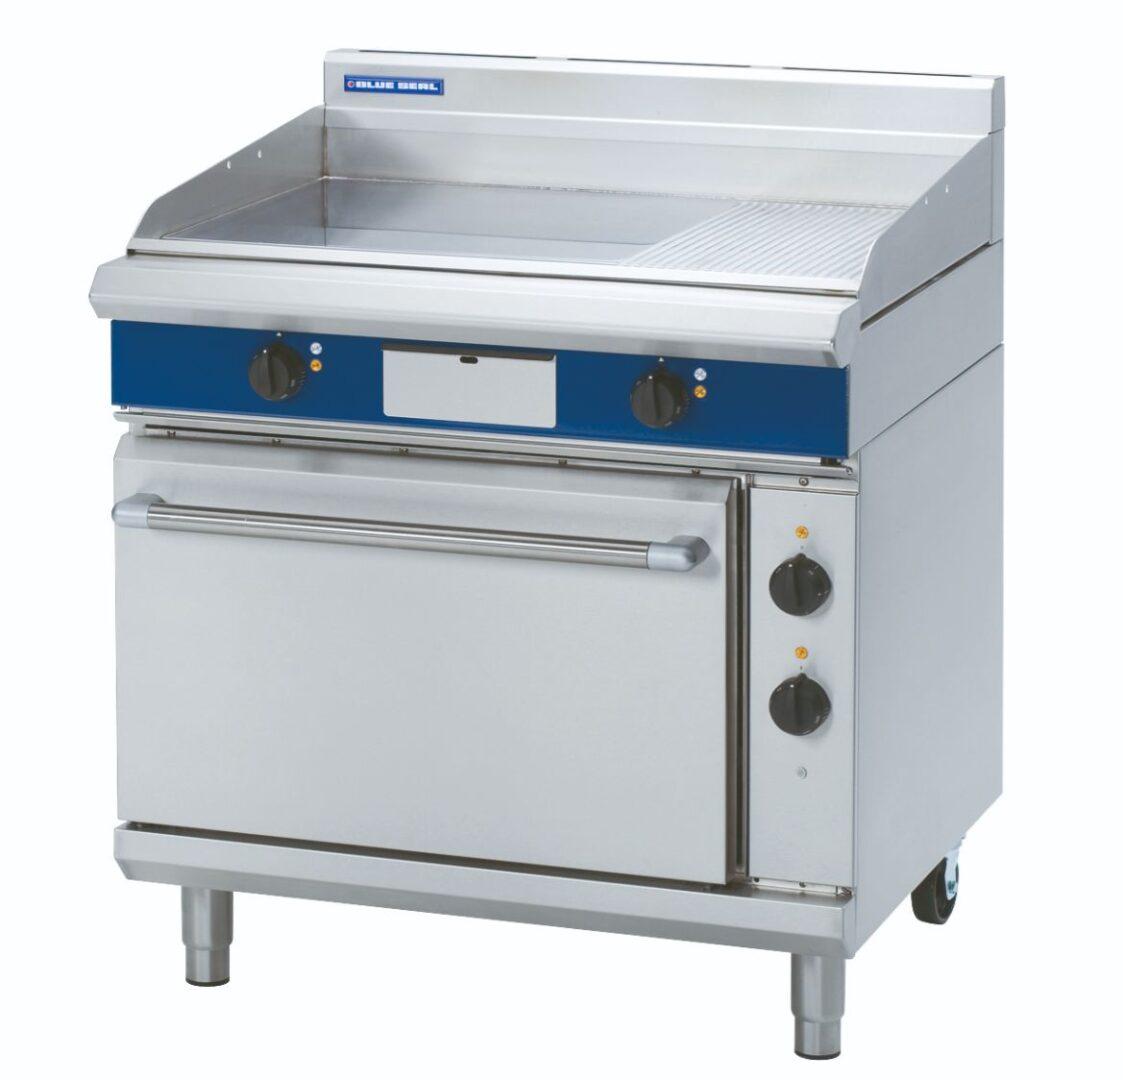 Blue Seal Evolution Series EP506 - 900mm Electric Griddle Static Oven Range